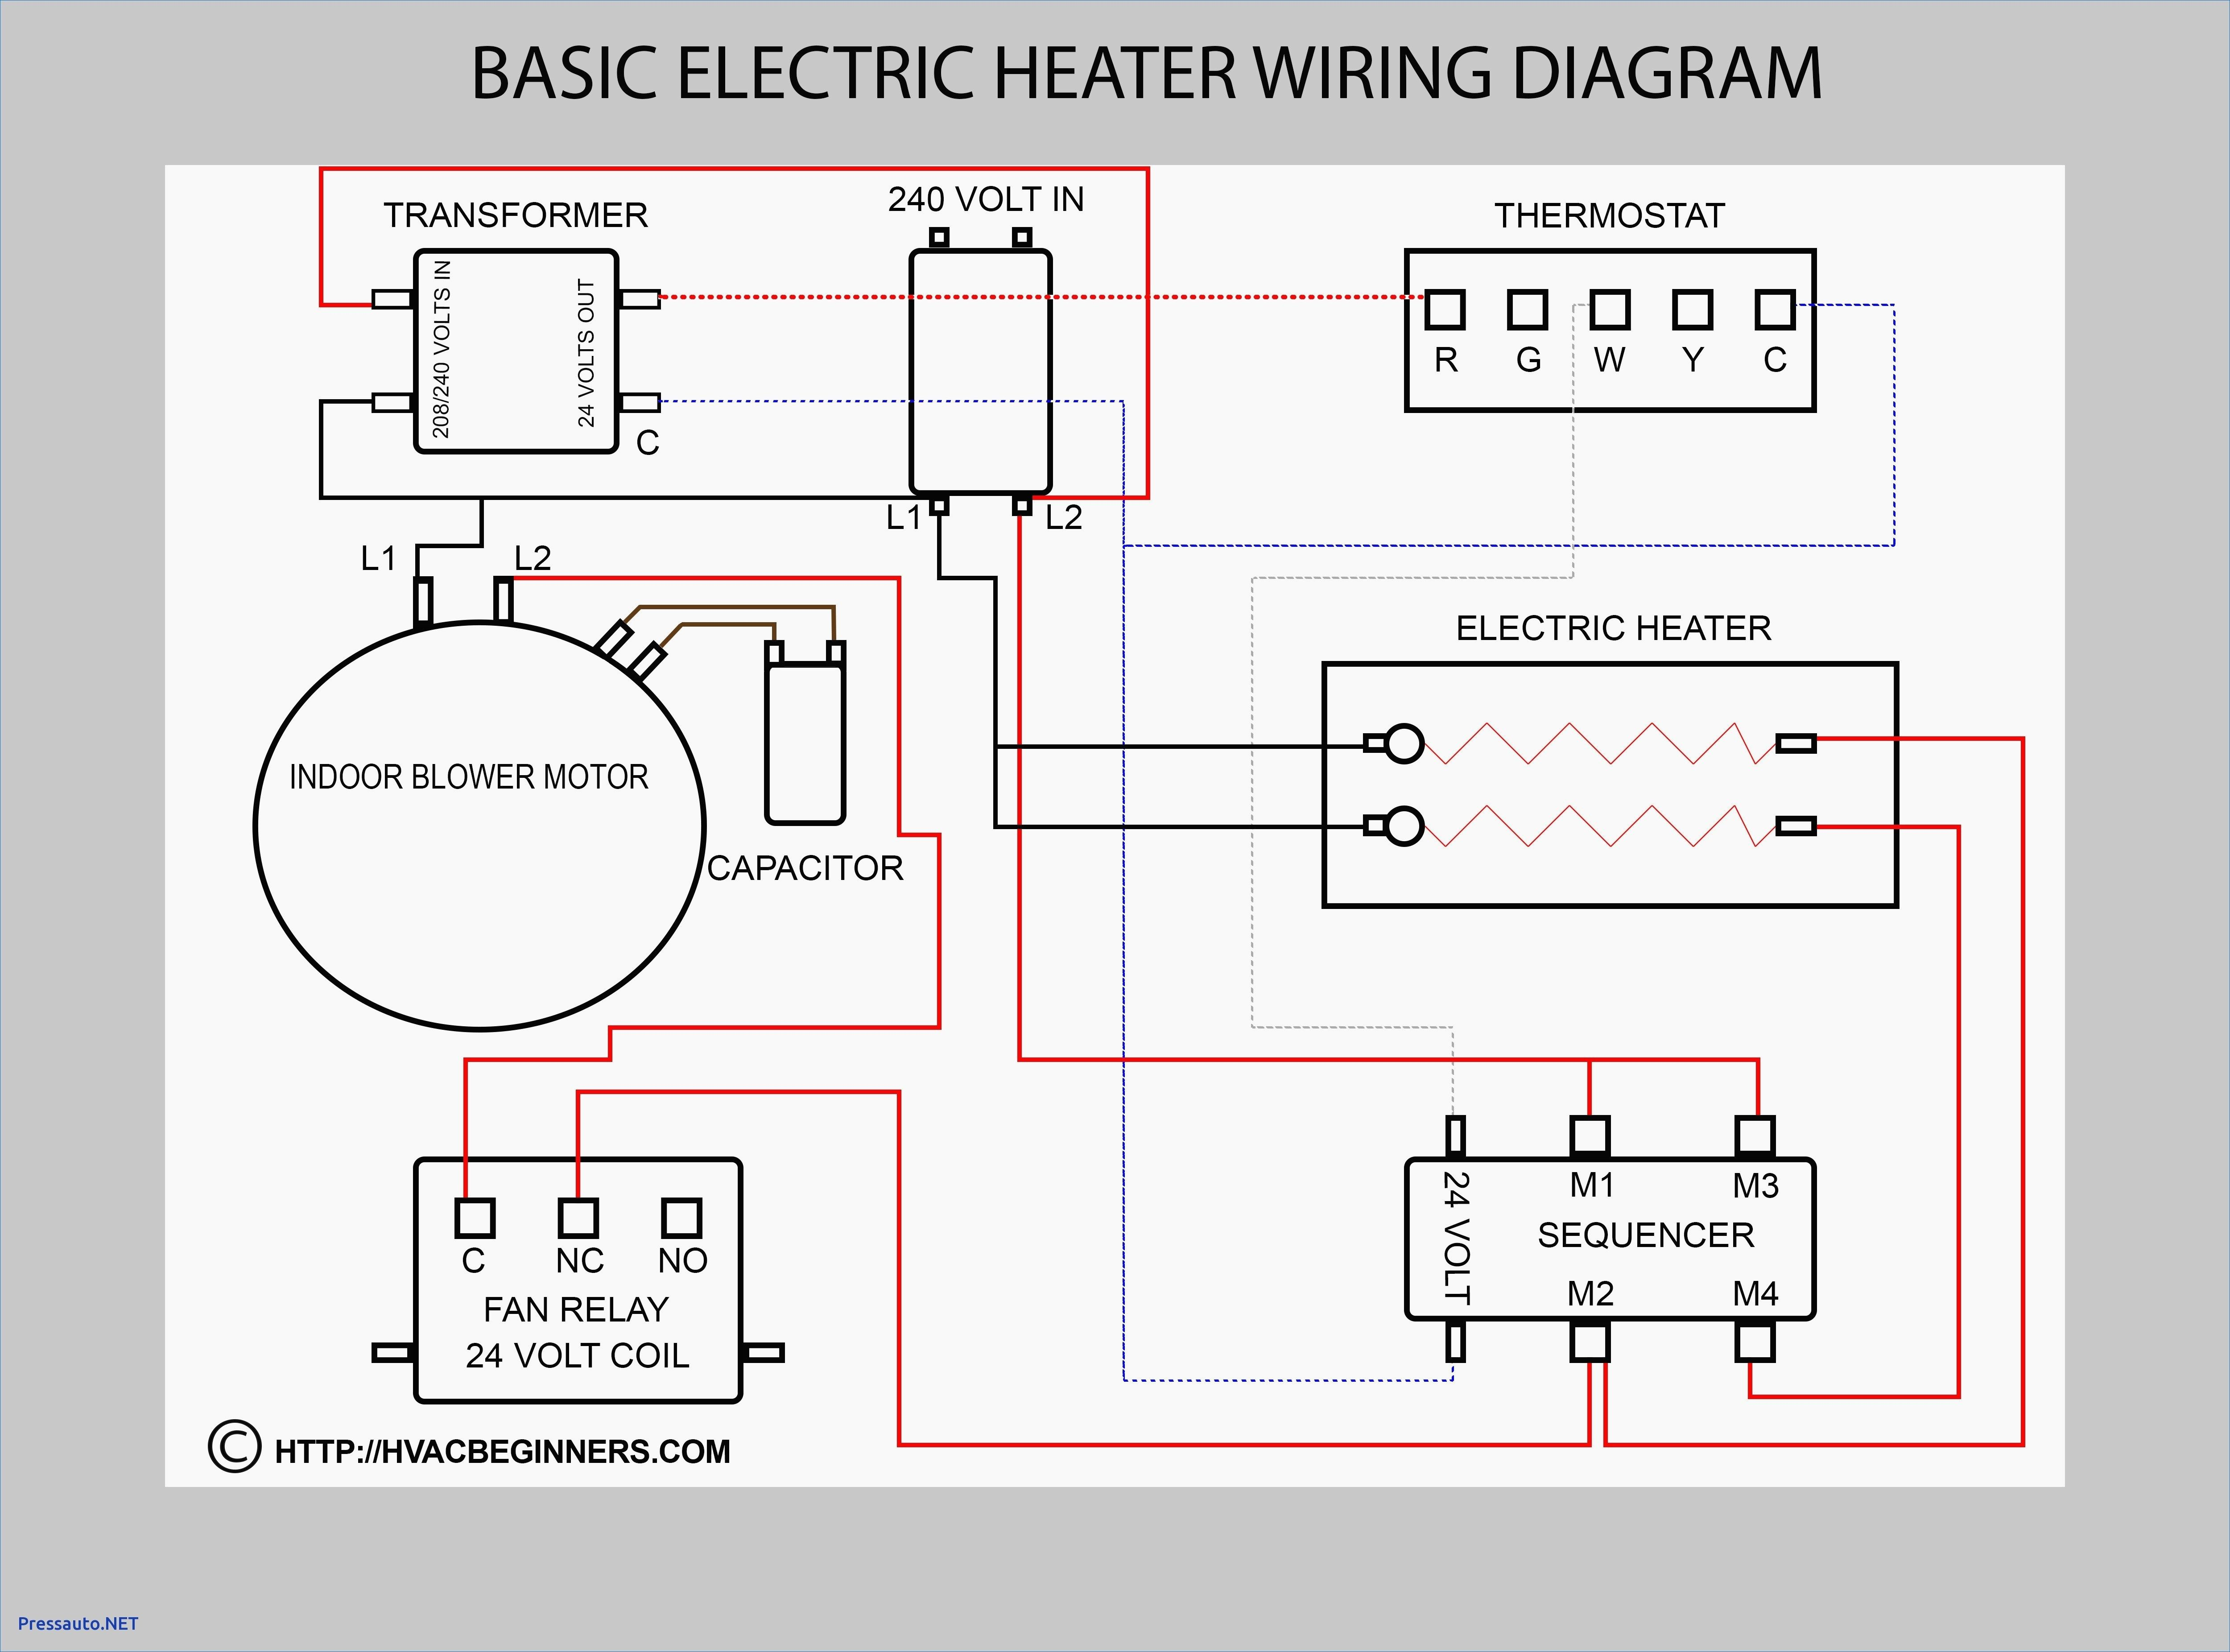 hight resolution of wiring diagram 220 volt campbell hausfeld wiring diagram meta 220 volt air compressor wiring diagram 240 volt air compressor wiring diagram